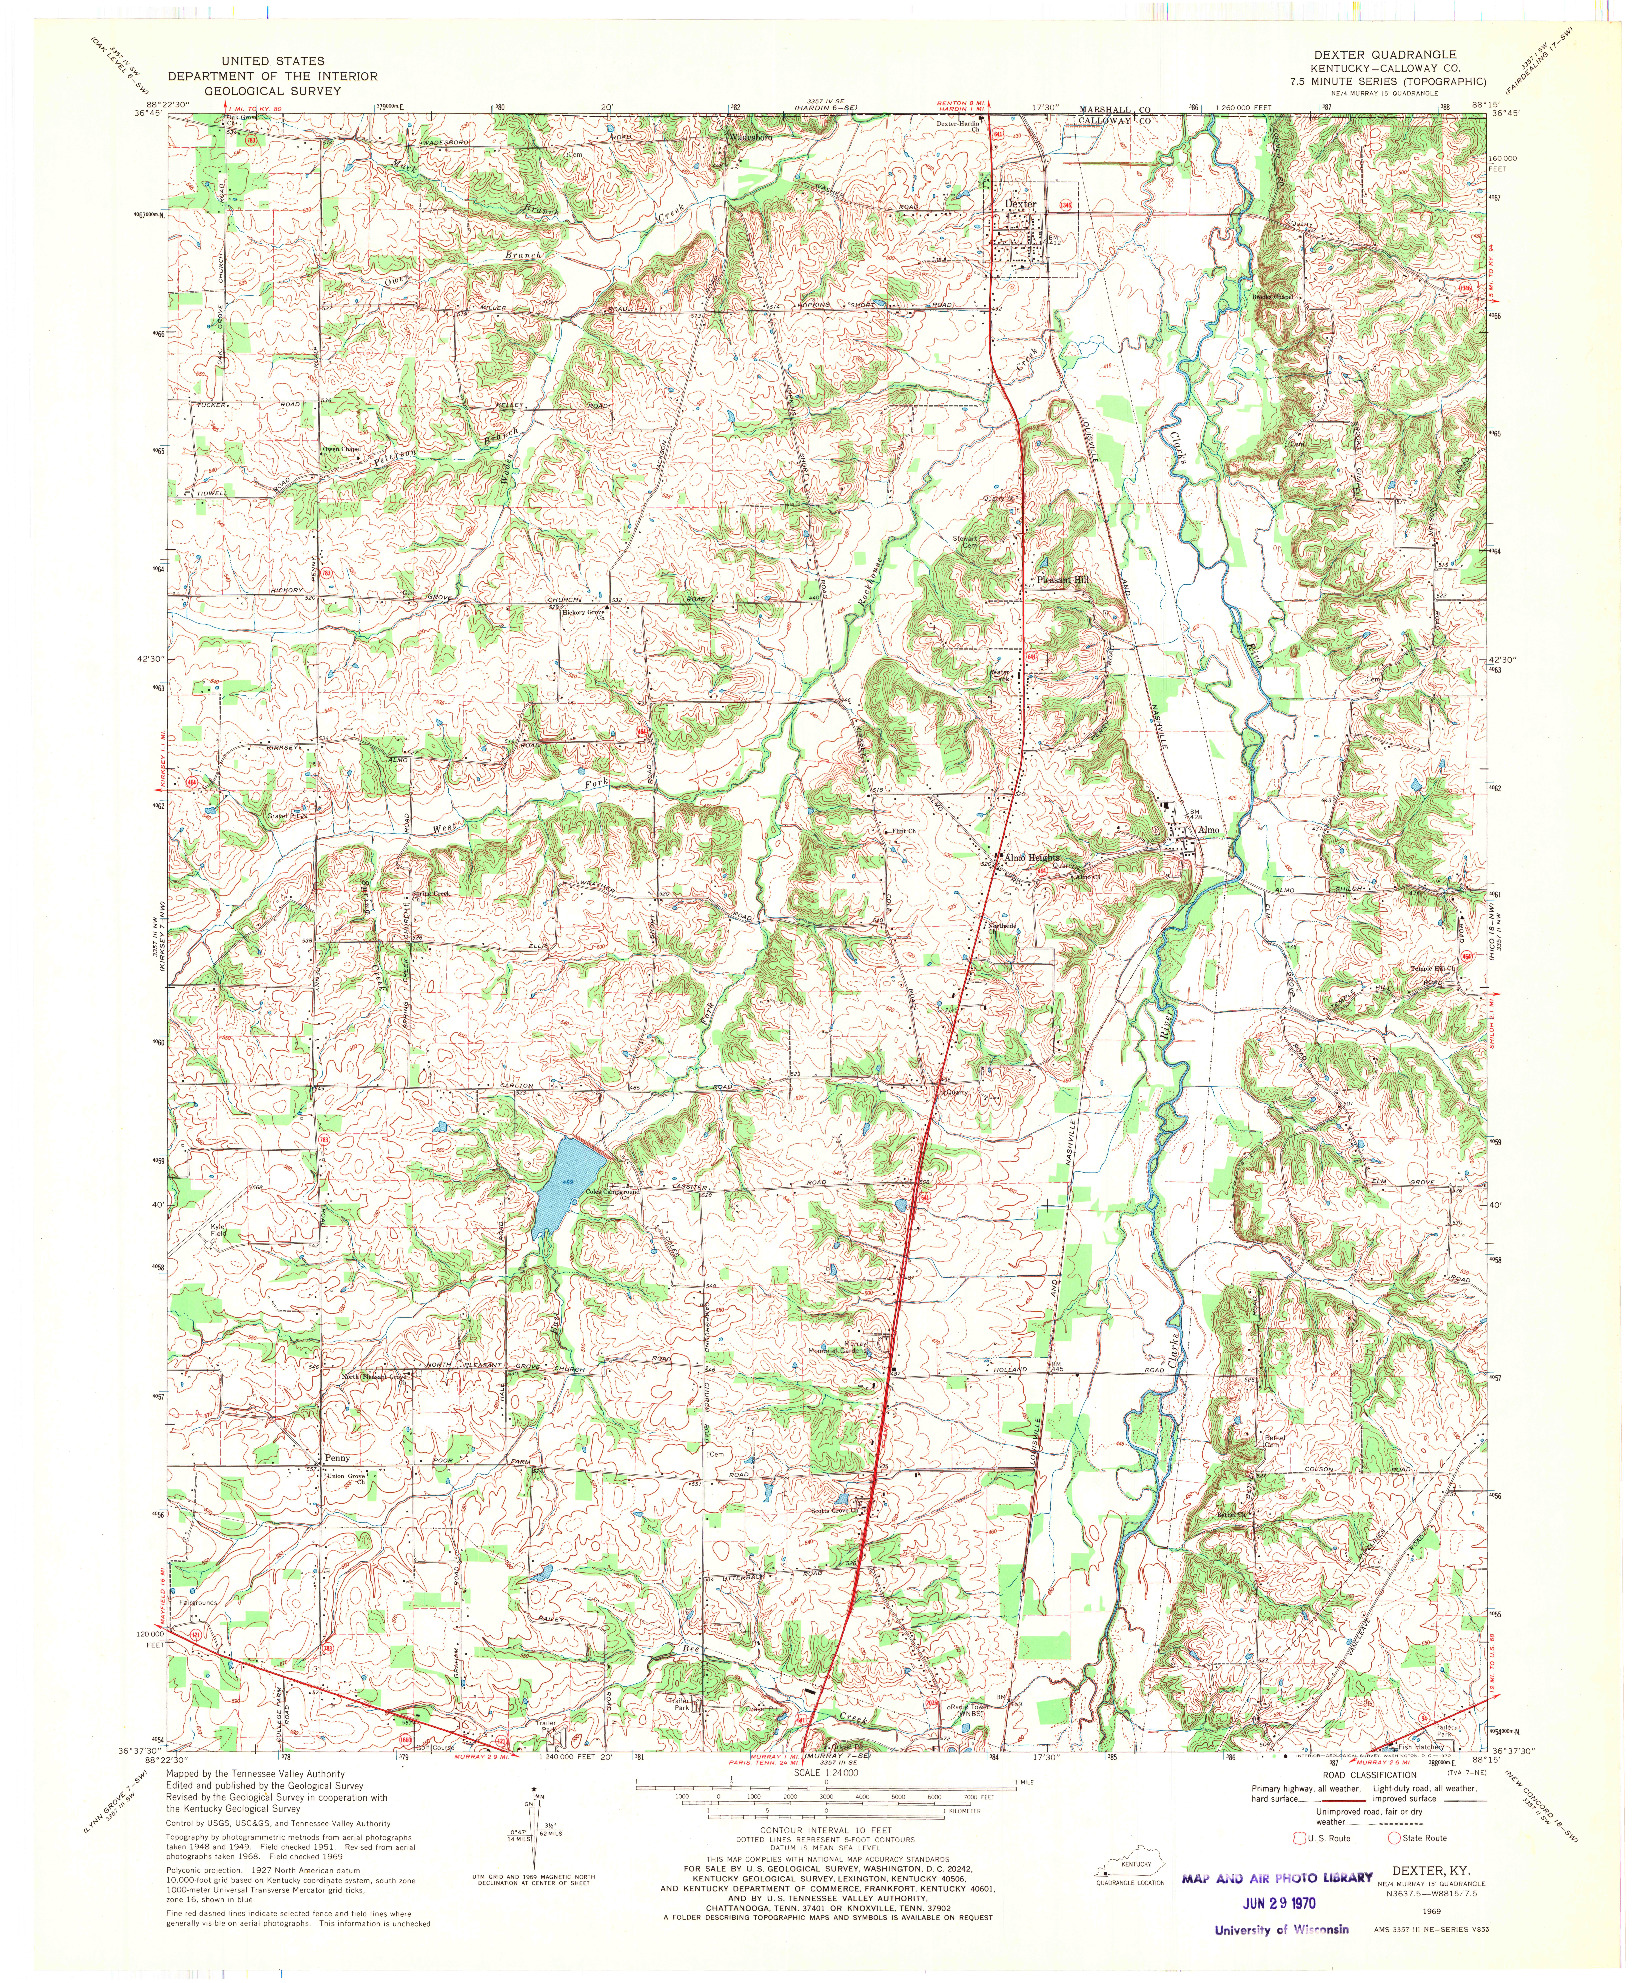 USGS 1:24000-SCALE QUADRANGLE FOR DEXTER, KY 1969